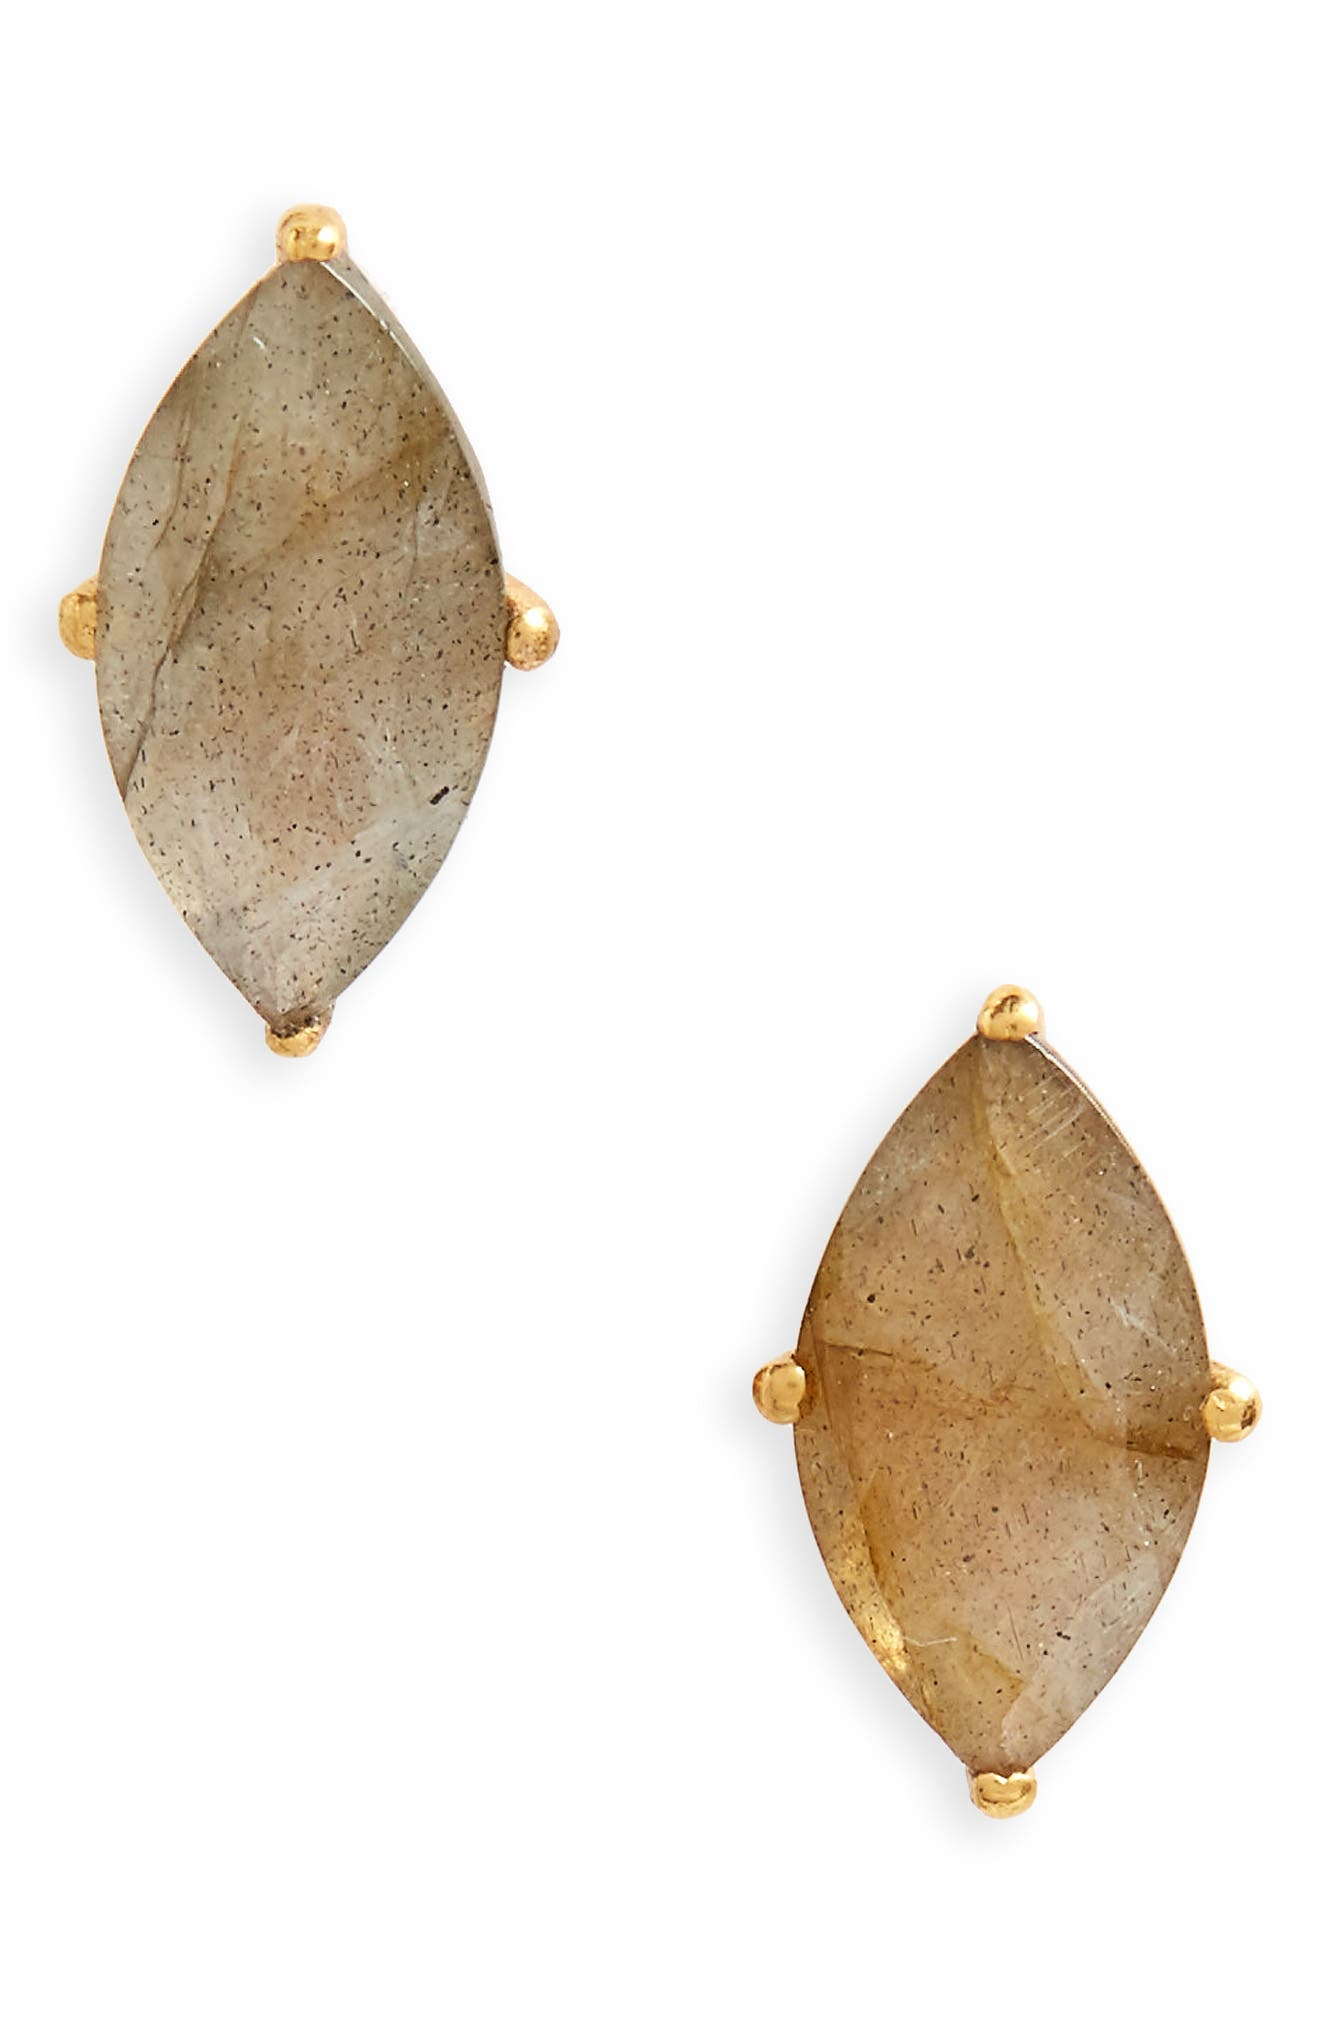 Lotus Stud Earrings,                             Main thumbnail 1, color,                             Labradorite/ Gold